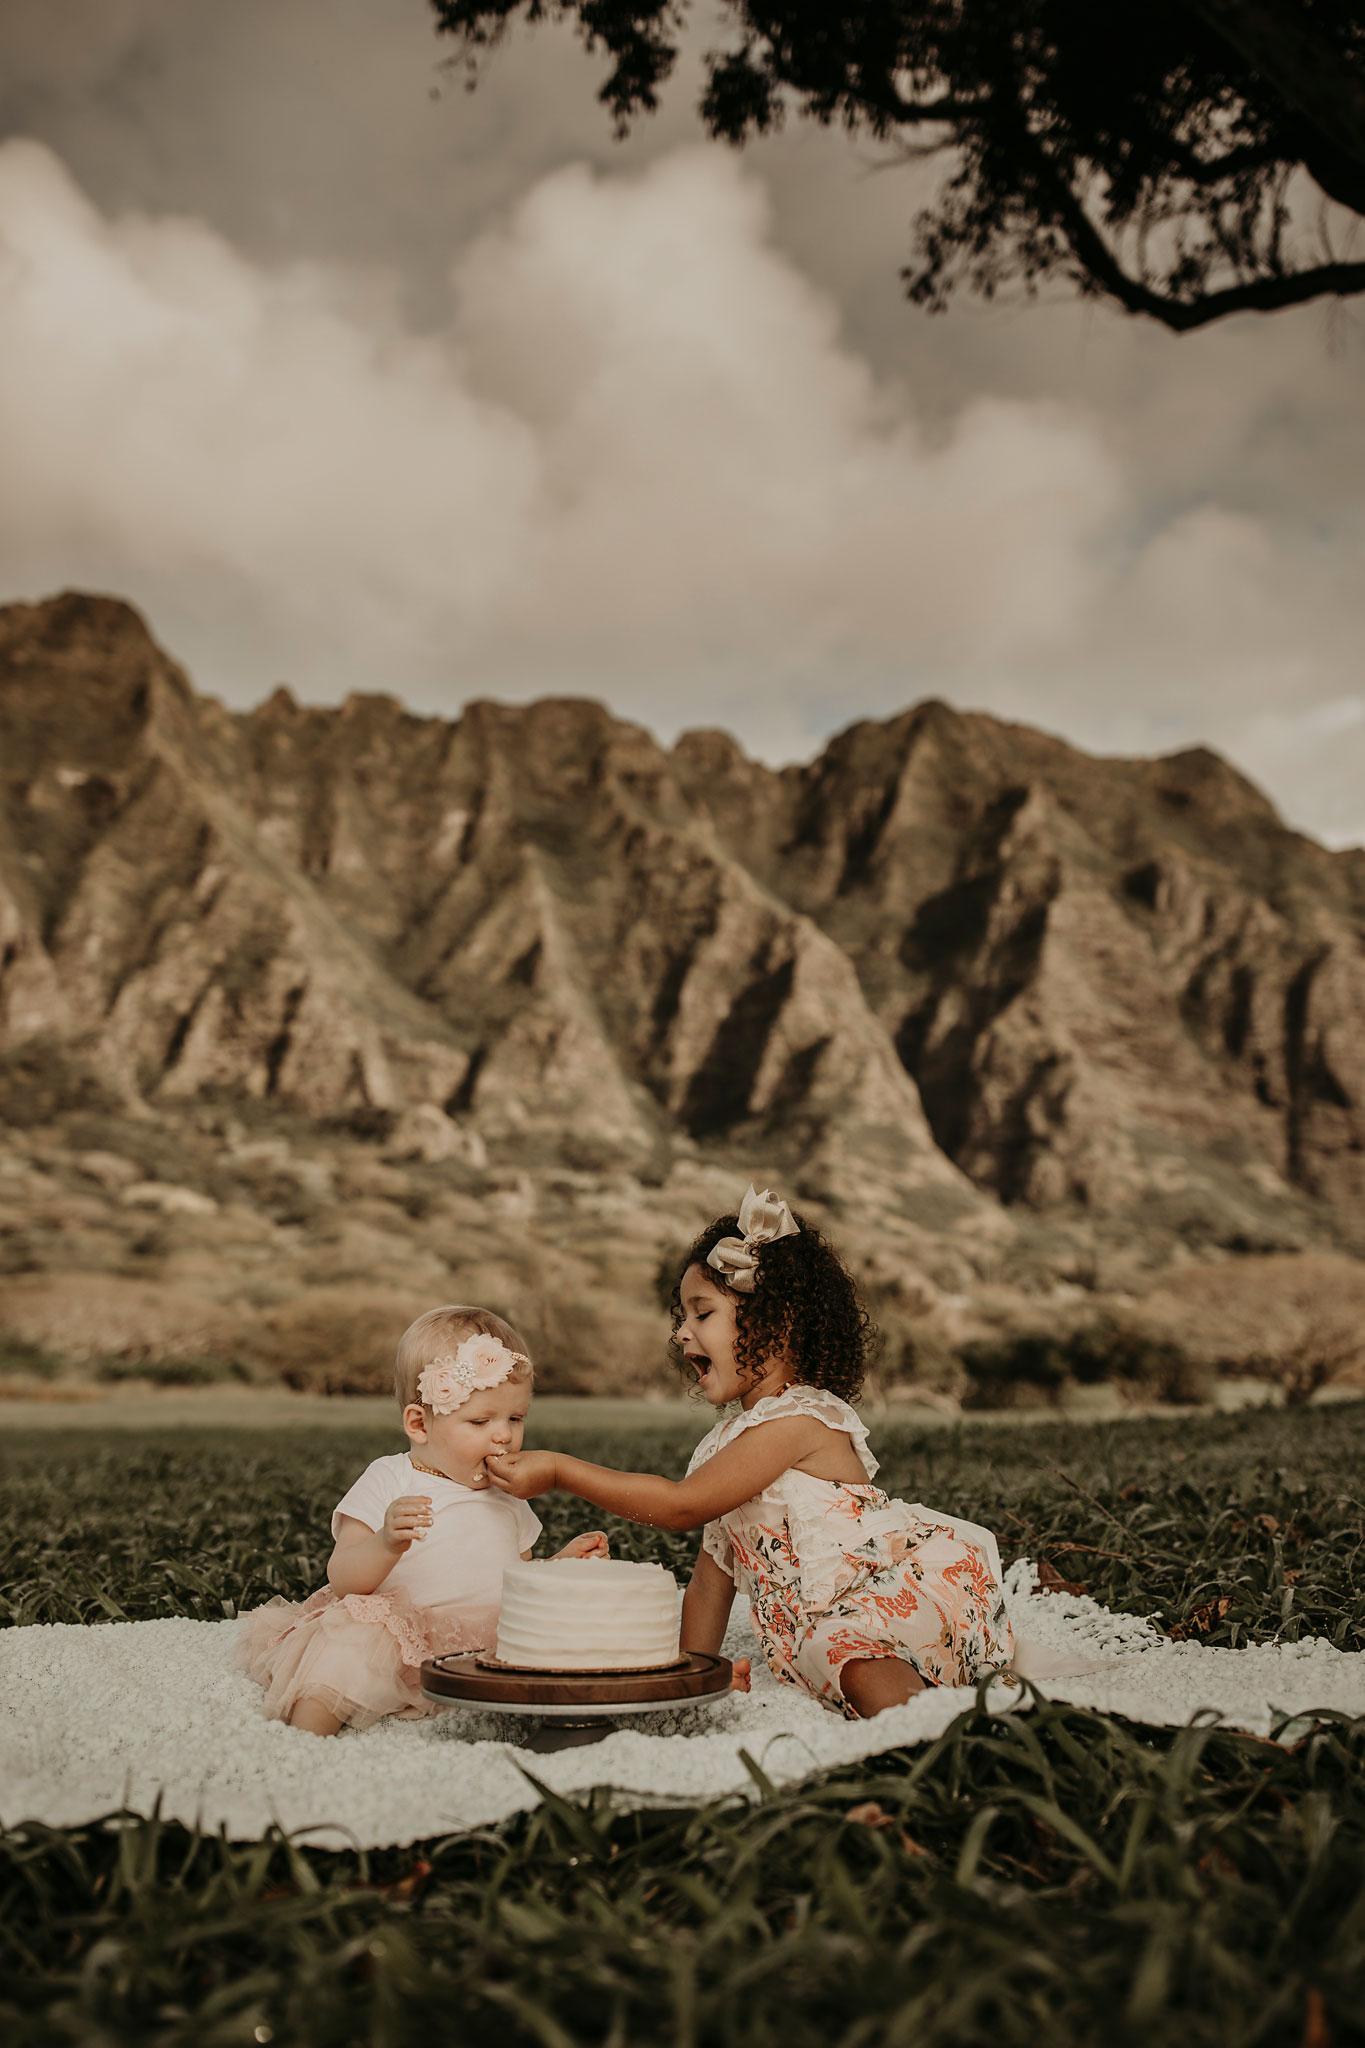 Sunrise-family-shoot-kualoa-ranch-30.jpg